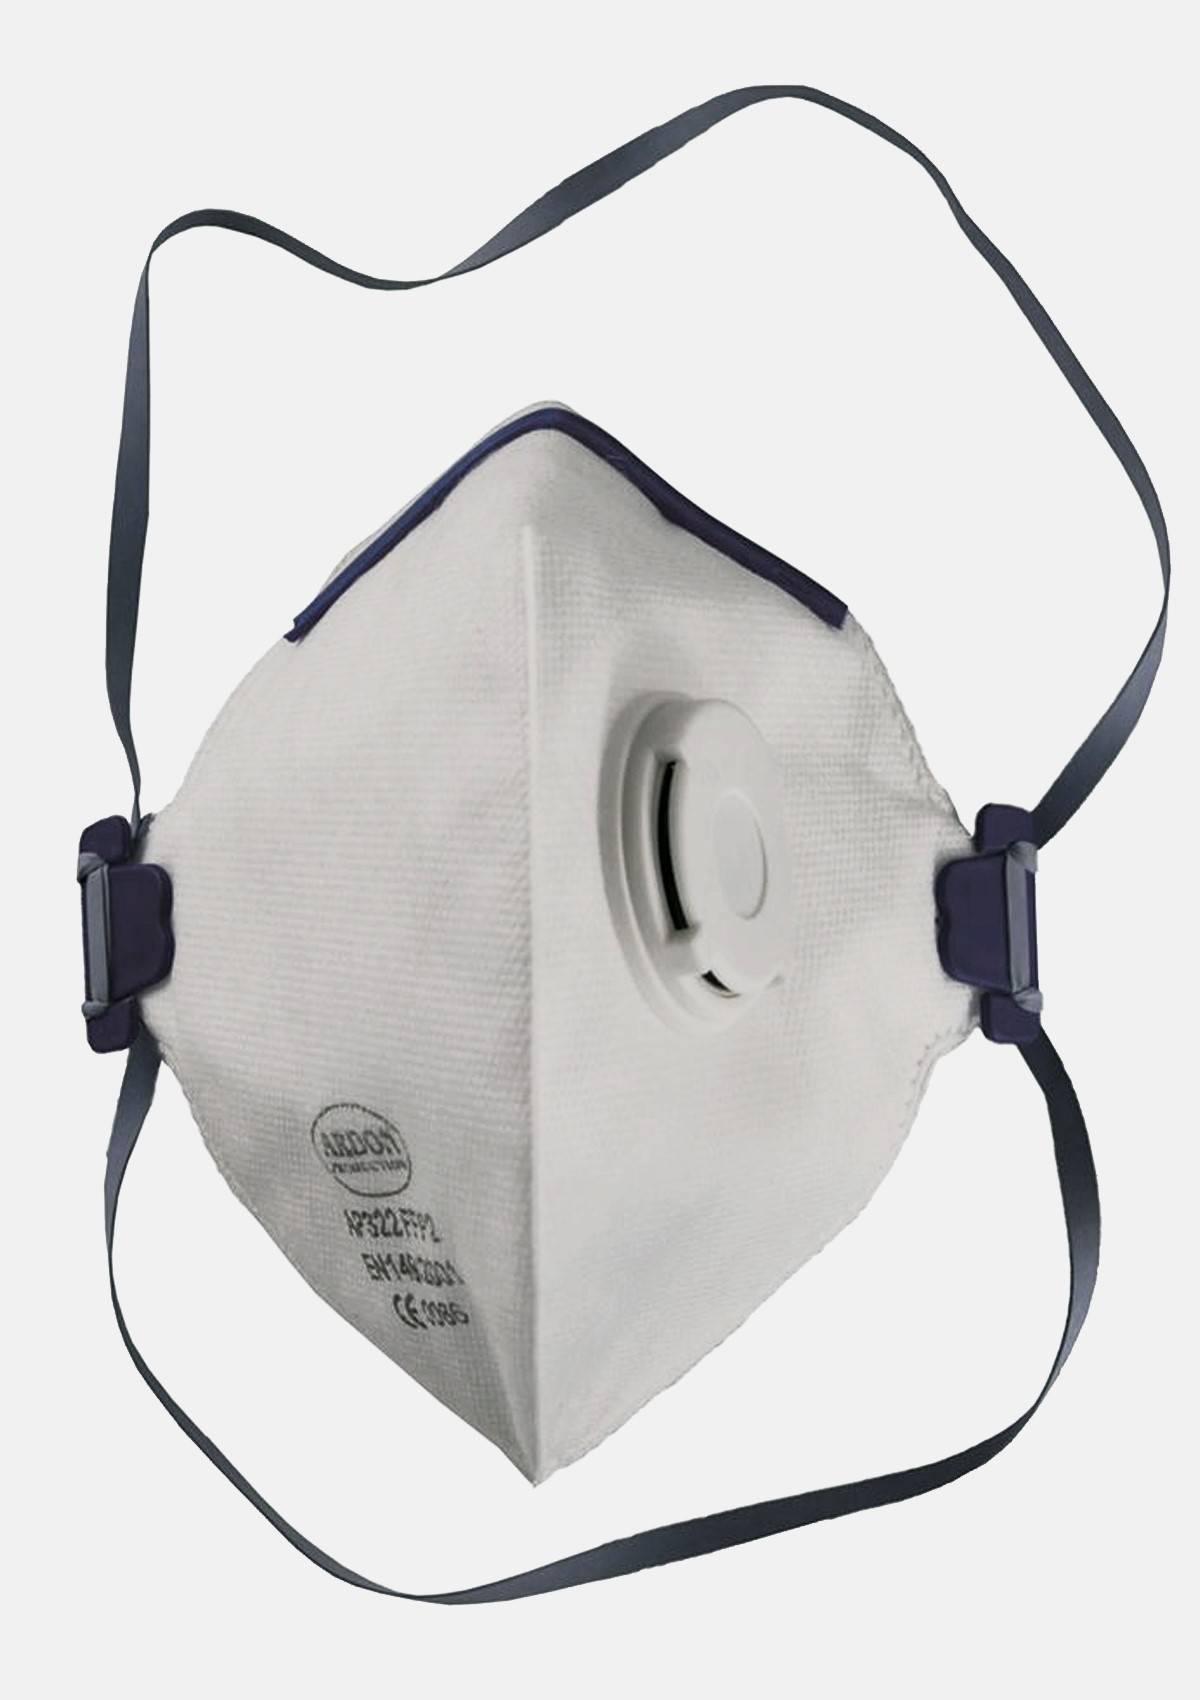 FFP2 Maske mit Ventil (3AP322) - der Walter